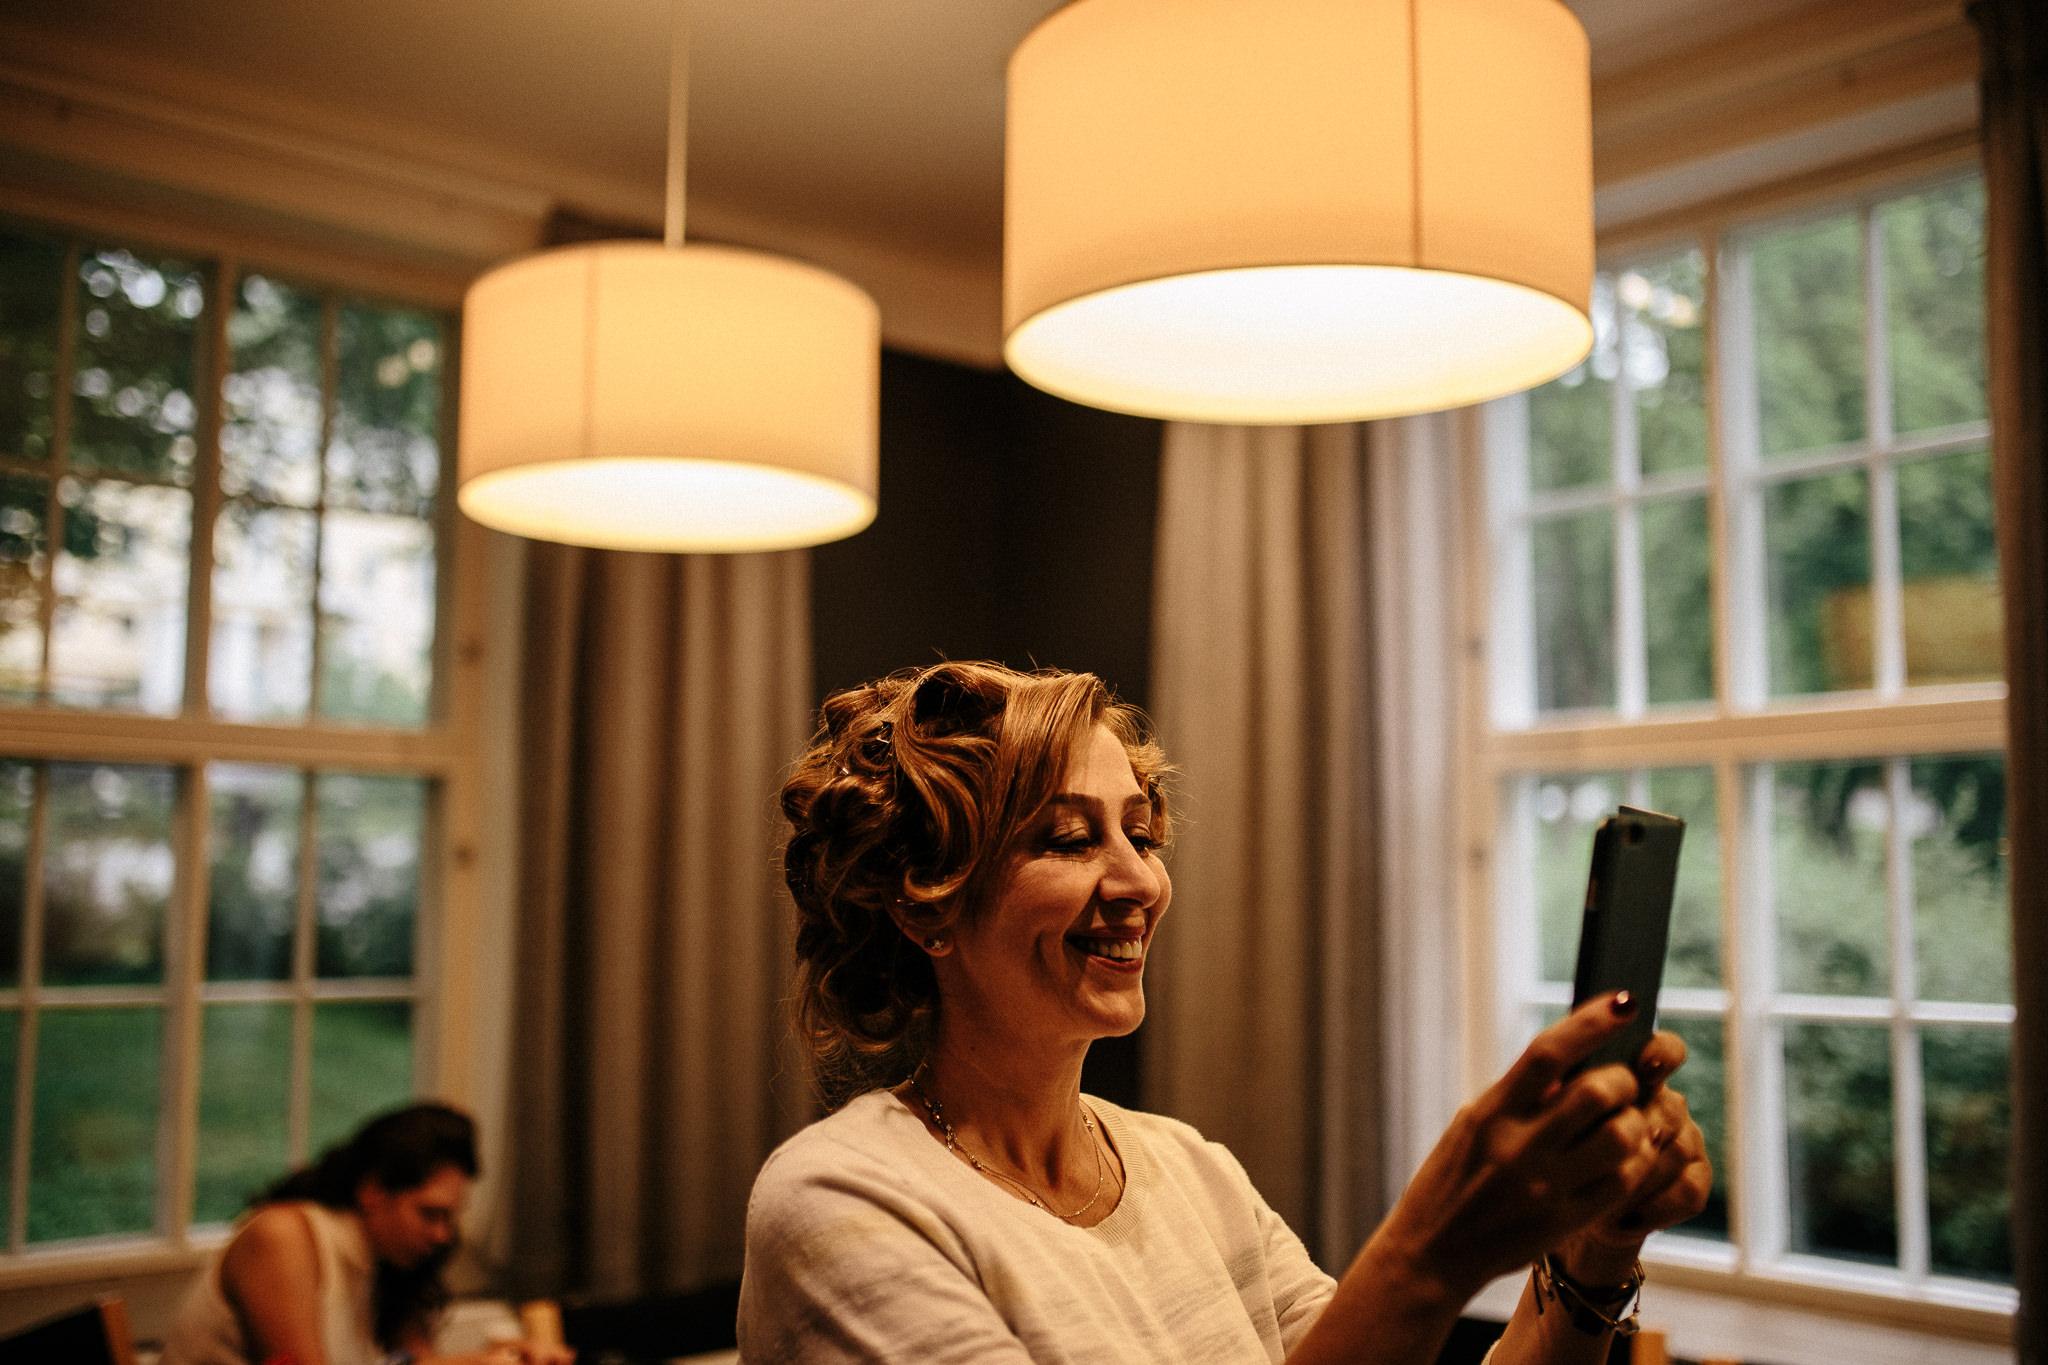 Ceren & Jani - Finland Wedding Photographer - Weddings by Qay - Wedding Photographer (22 of 166).jpg